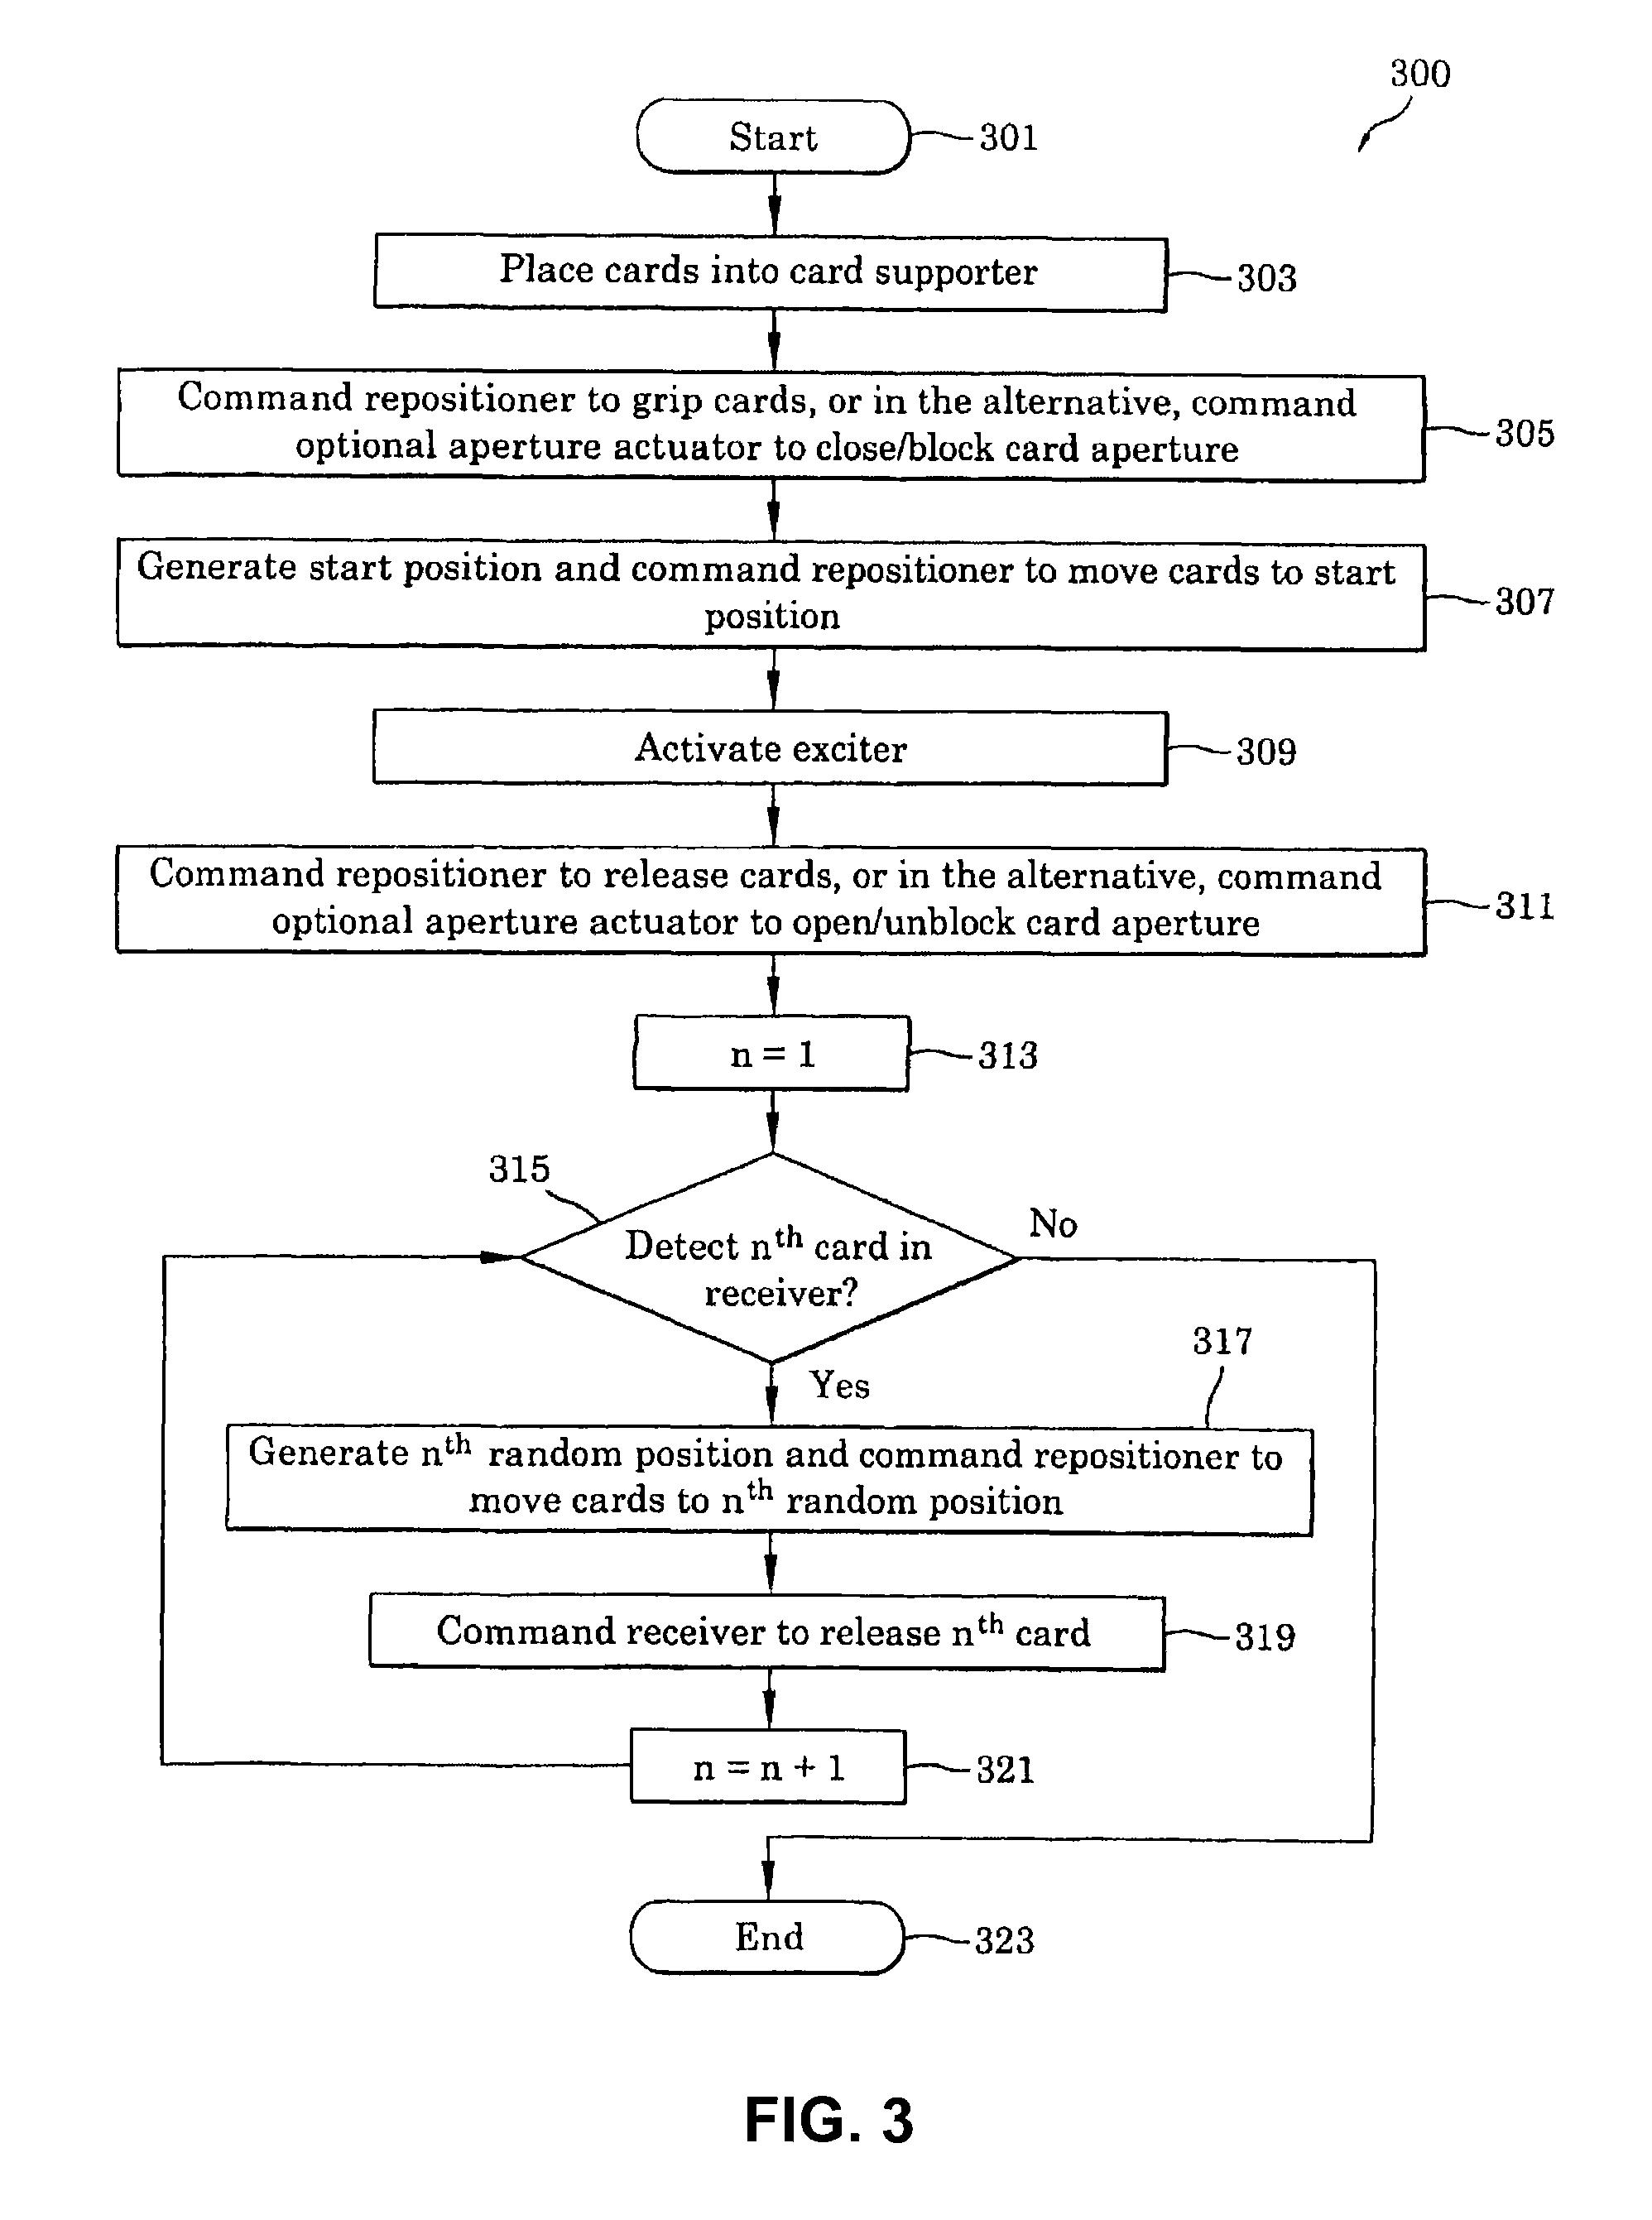 Patent US 9,744,436 B2